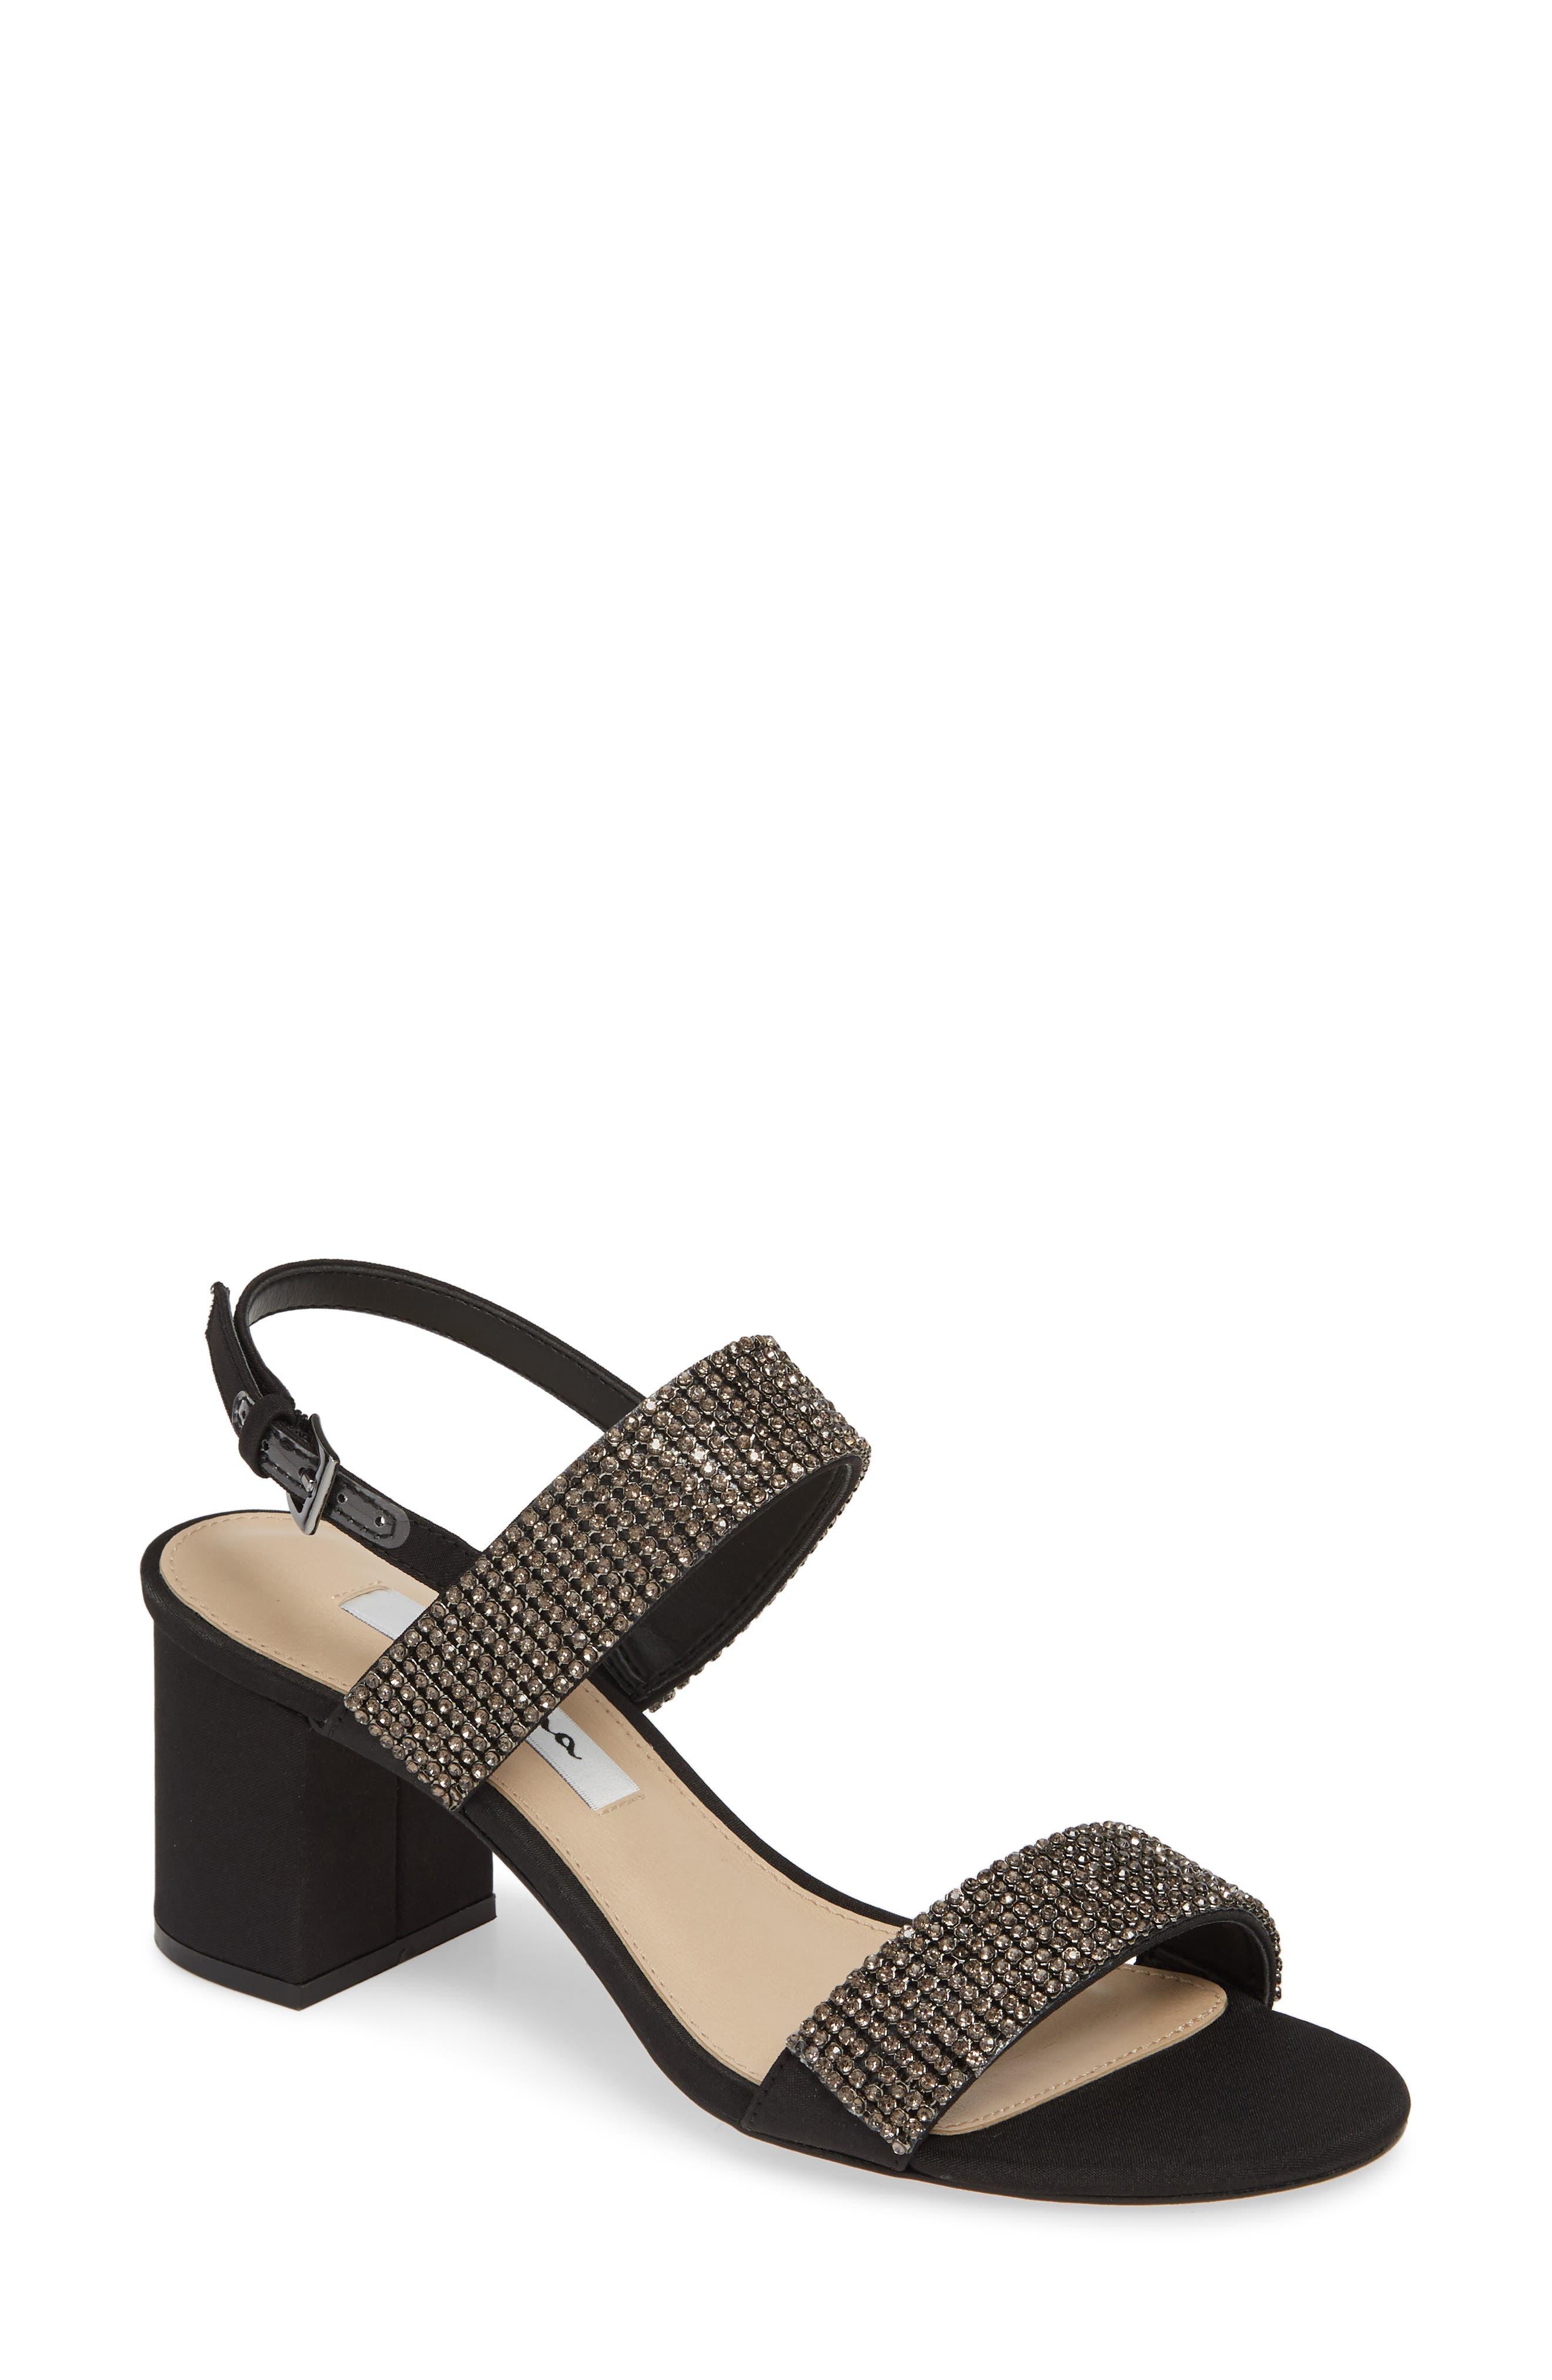 Naomi Crystal Embellished Sandal,                             Main thumbnail 1, color,                             BLACK FABRIC